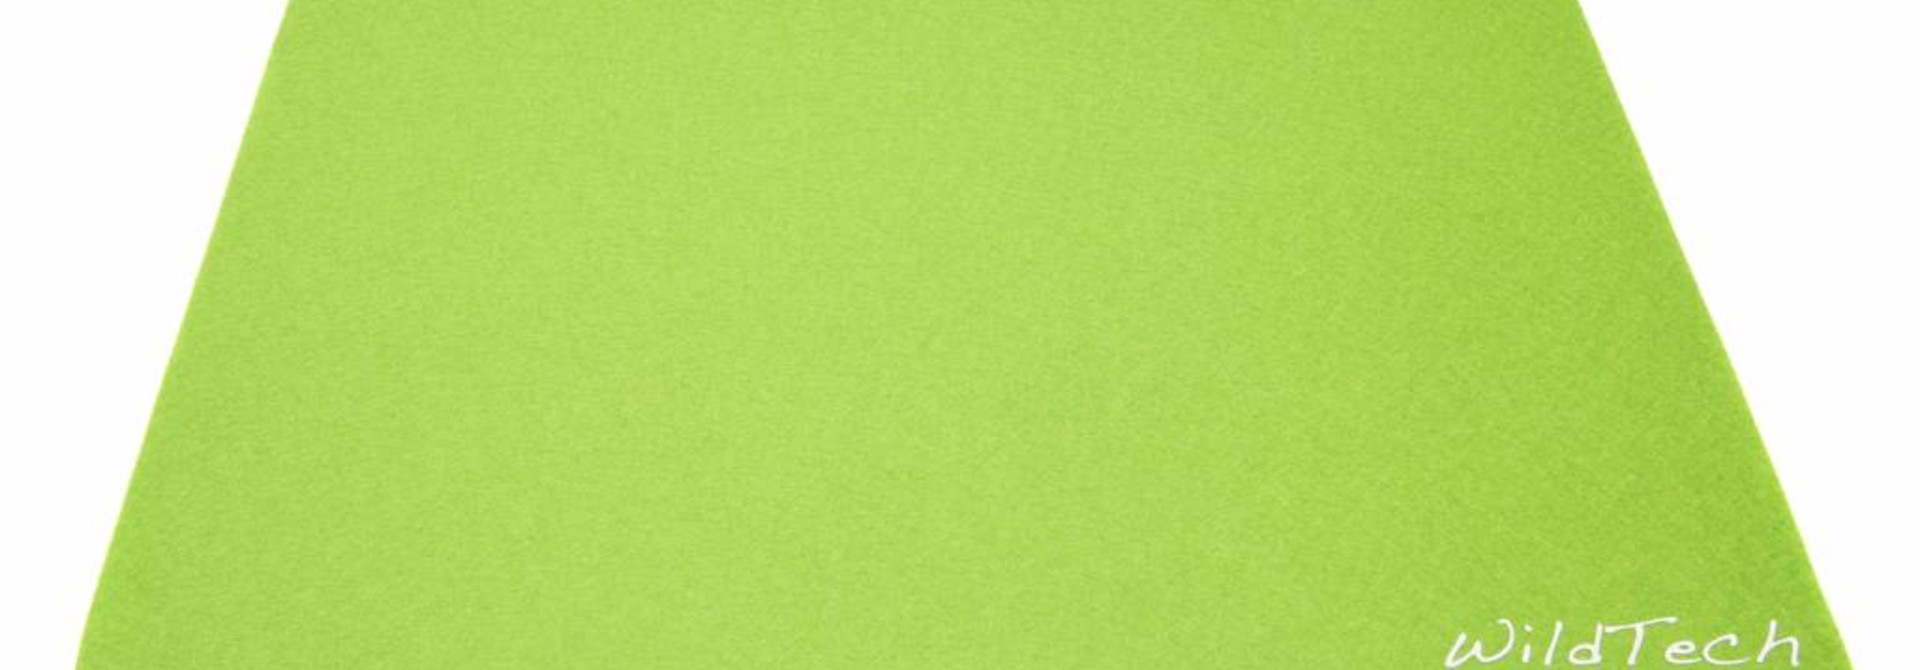 Push DeckCover Bright-Green